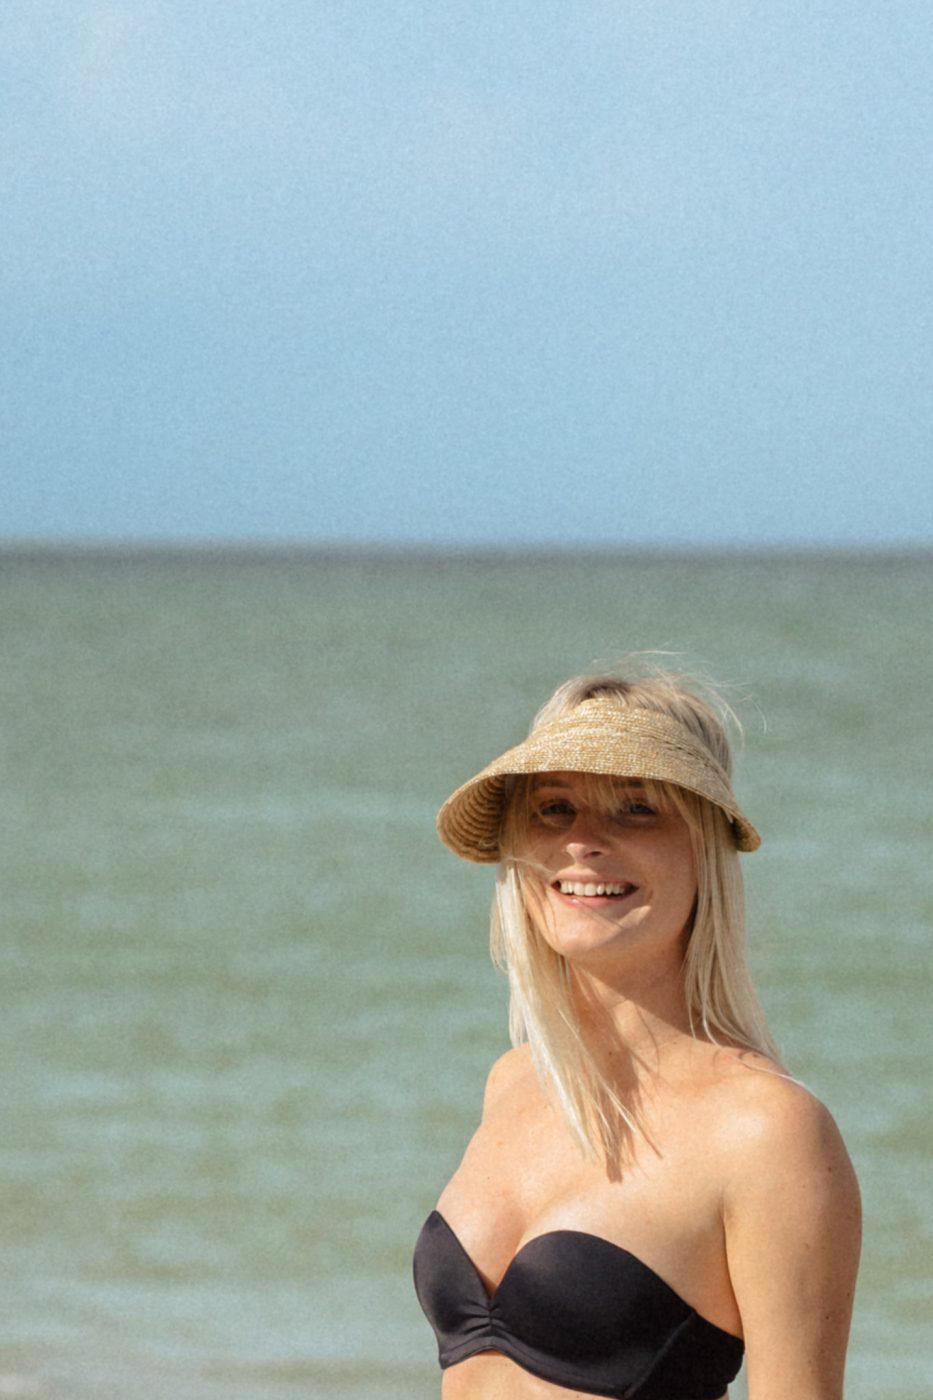 Upbra swimsuit - Sweet Teal